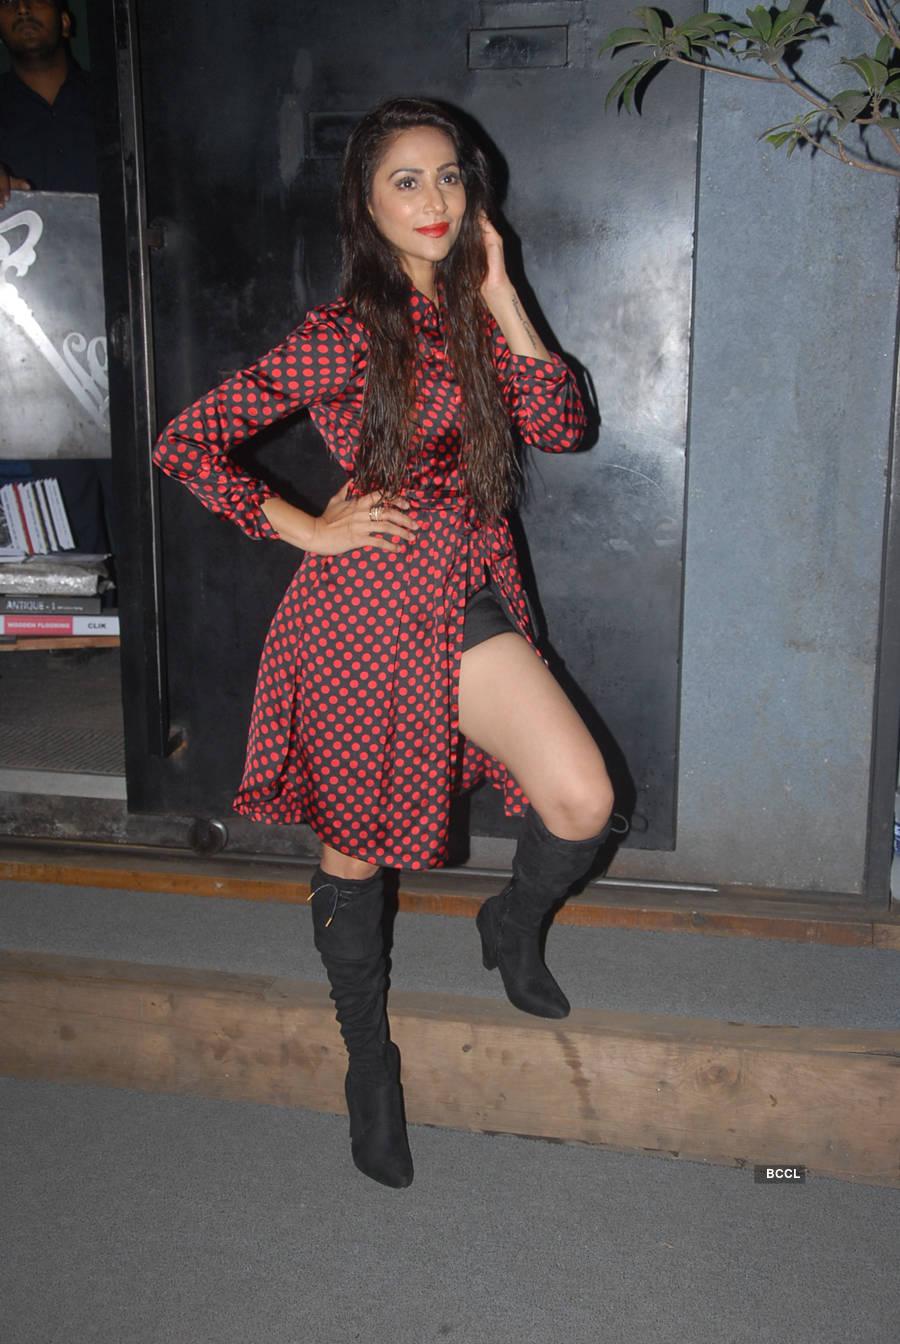 Actress Munisha Khatwani celebrates birthday with friends